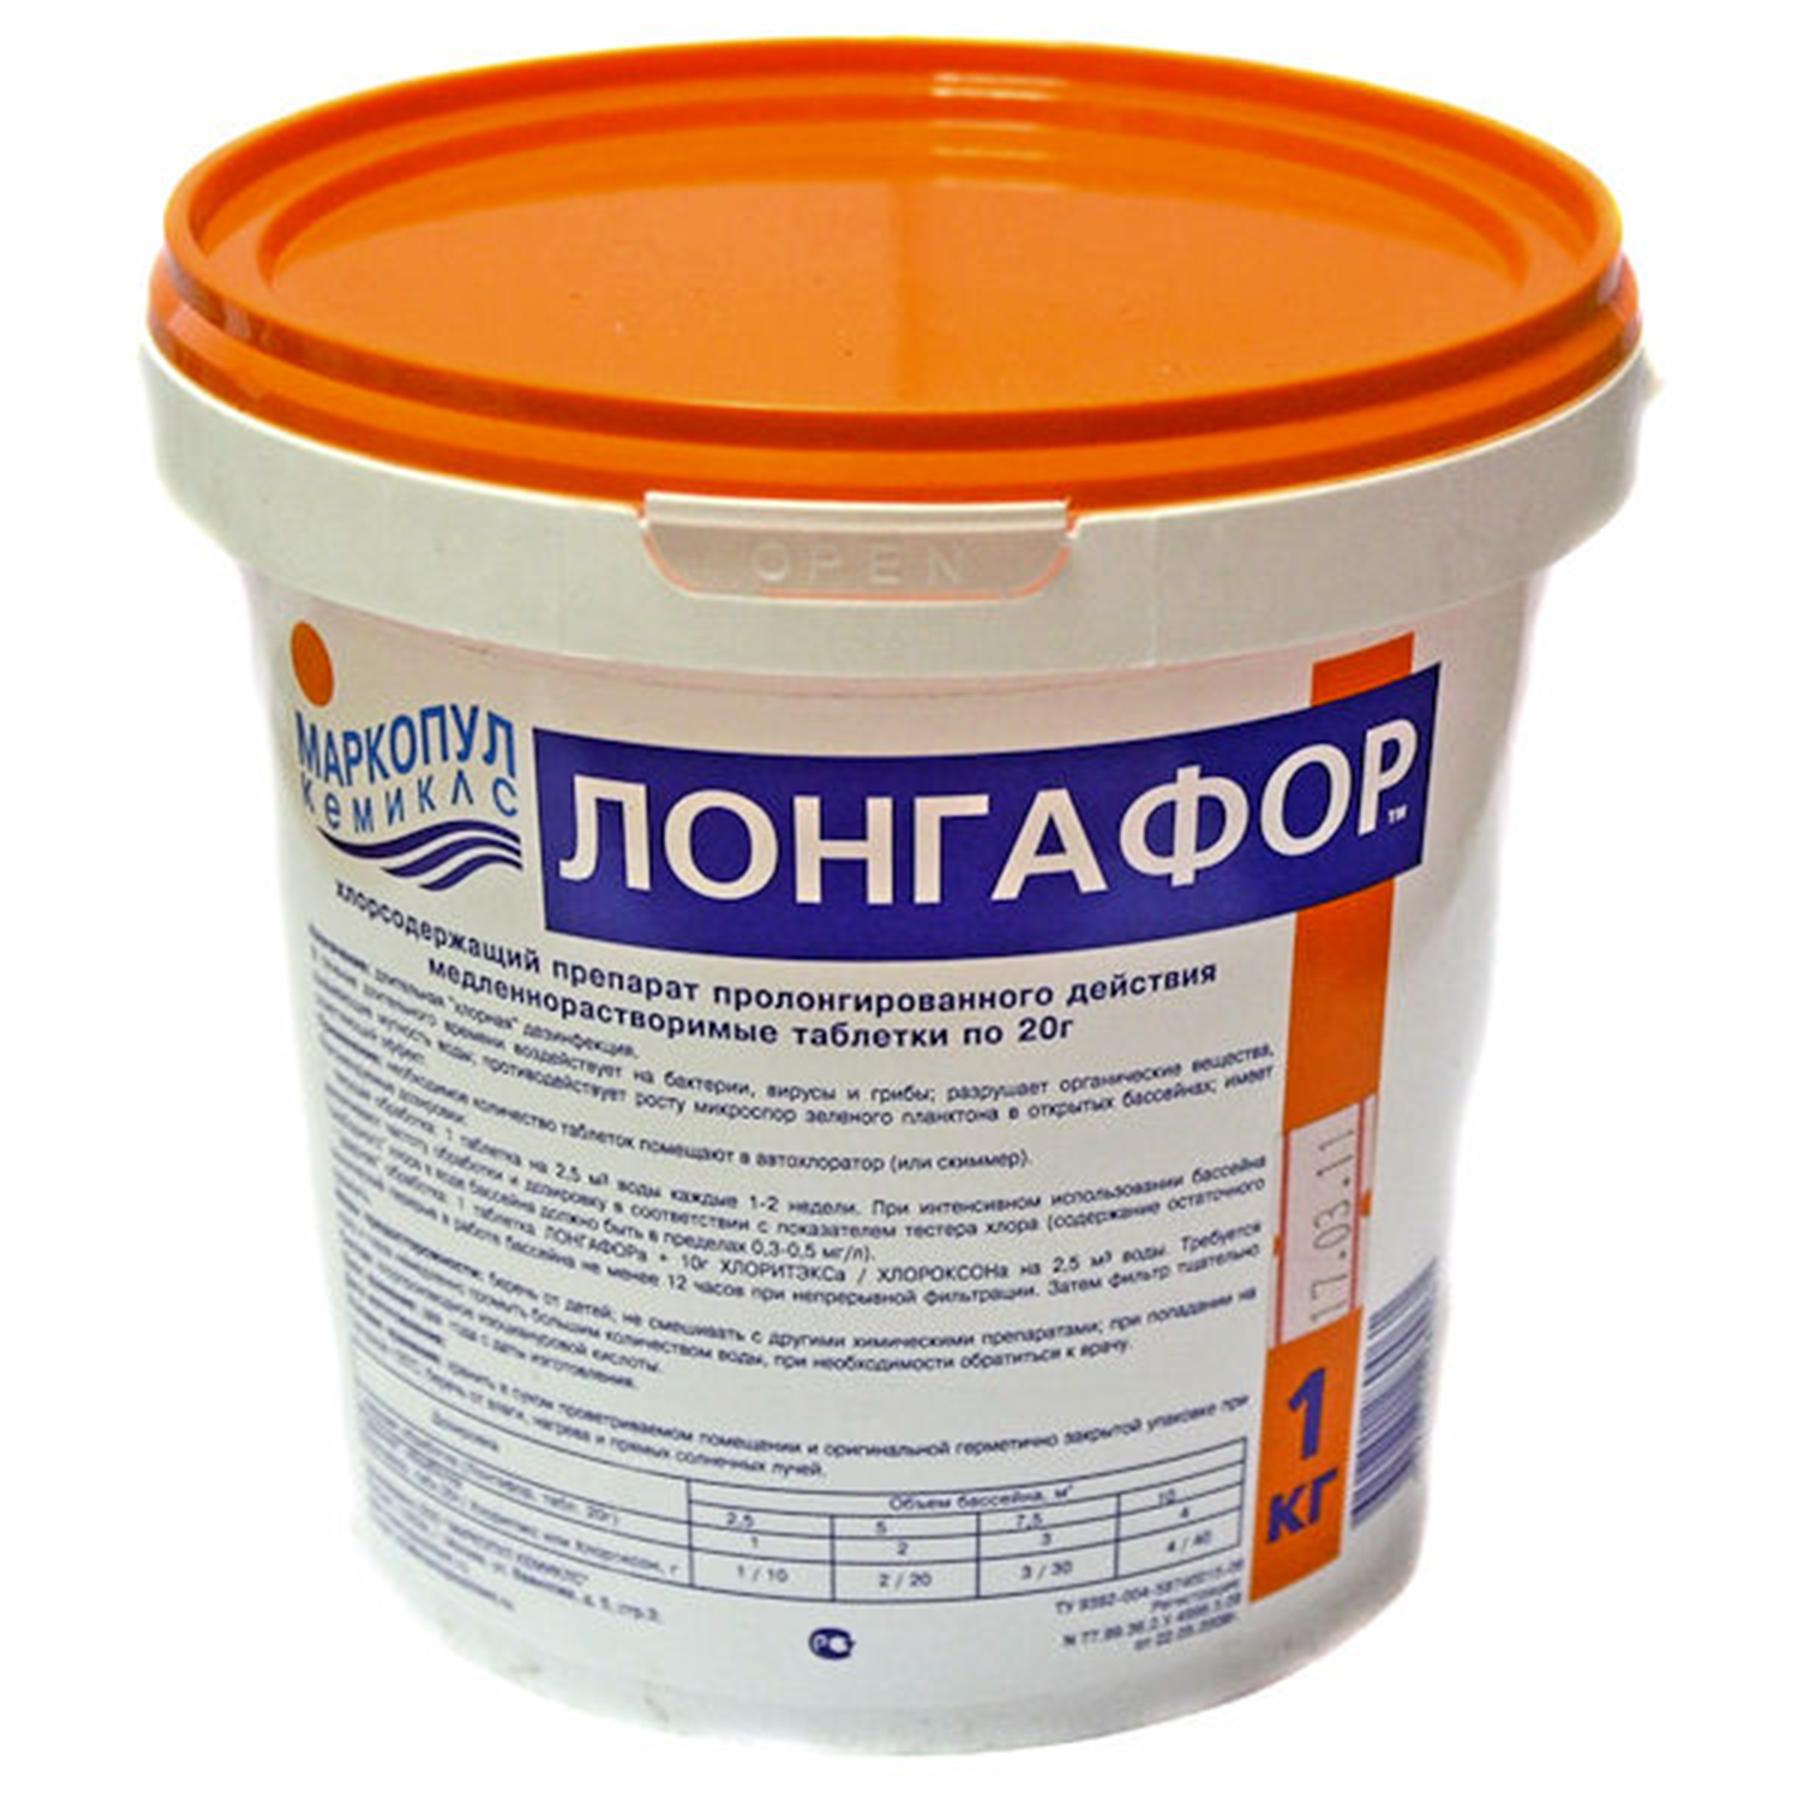 "Хим. препарат ""Лонгафор"" ведро 1 кг  таблетки 20 гр (долгосрочное обеззараживание воды)"